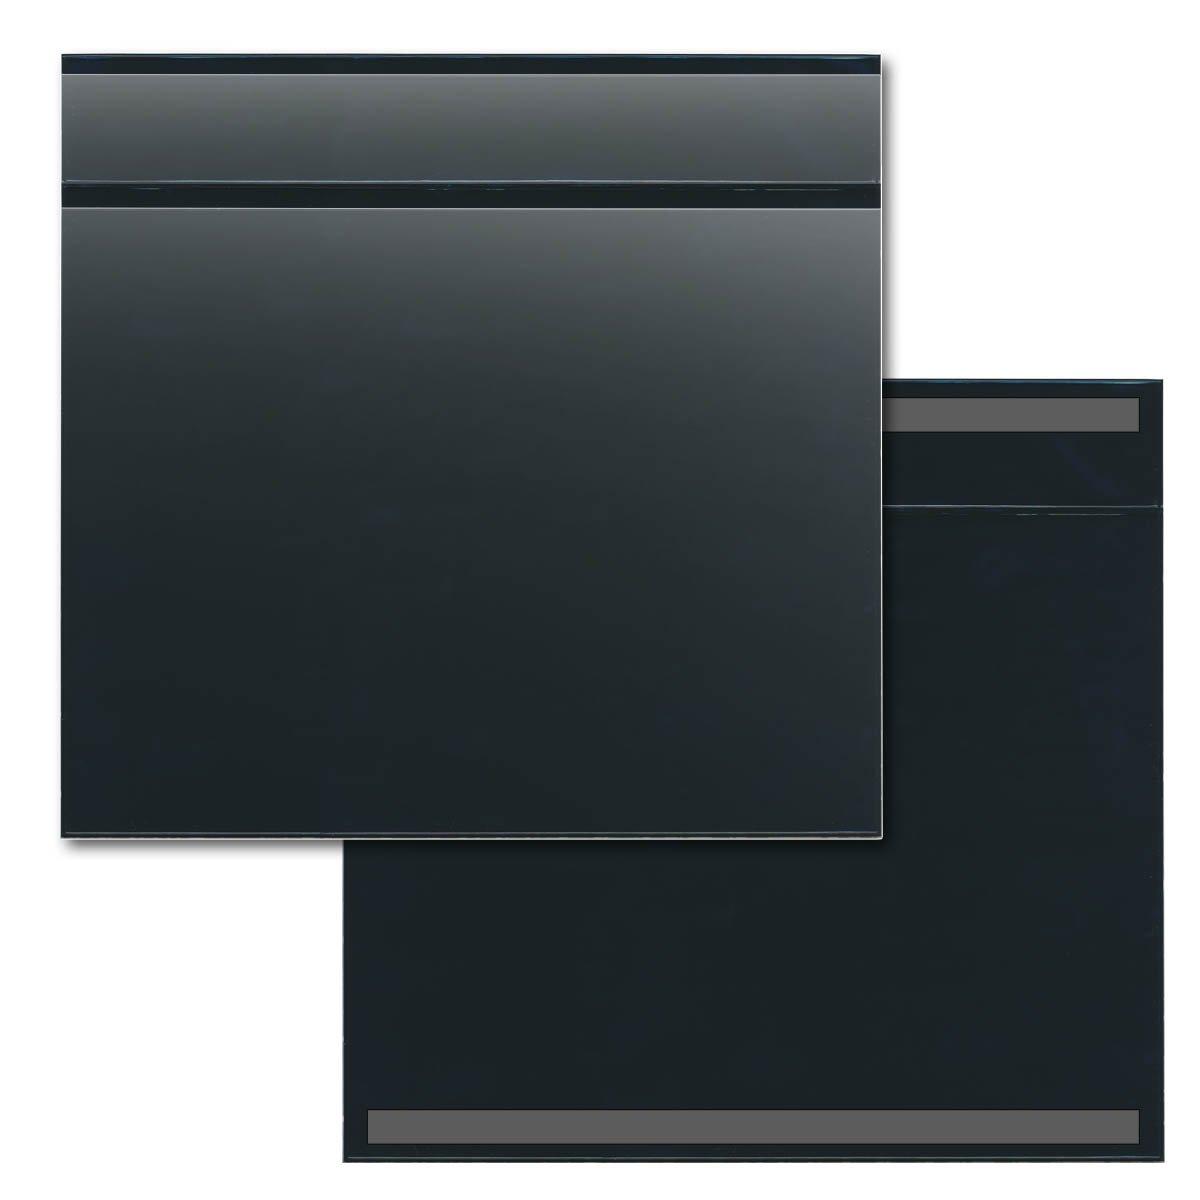 STORE SMART - 25-Pack Black Document Holder with Title Pocket - Horizontal - R529PQBKM-25